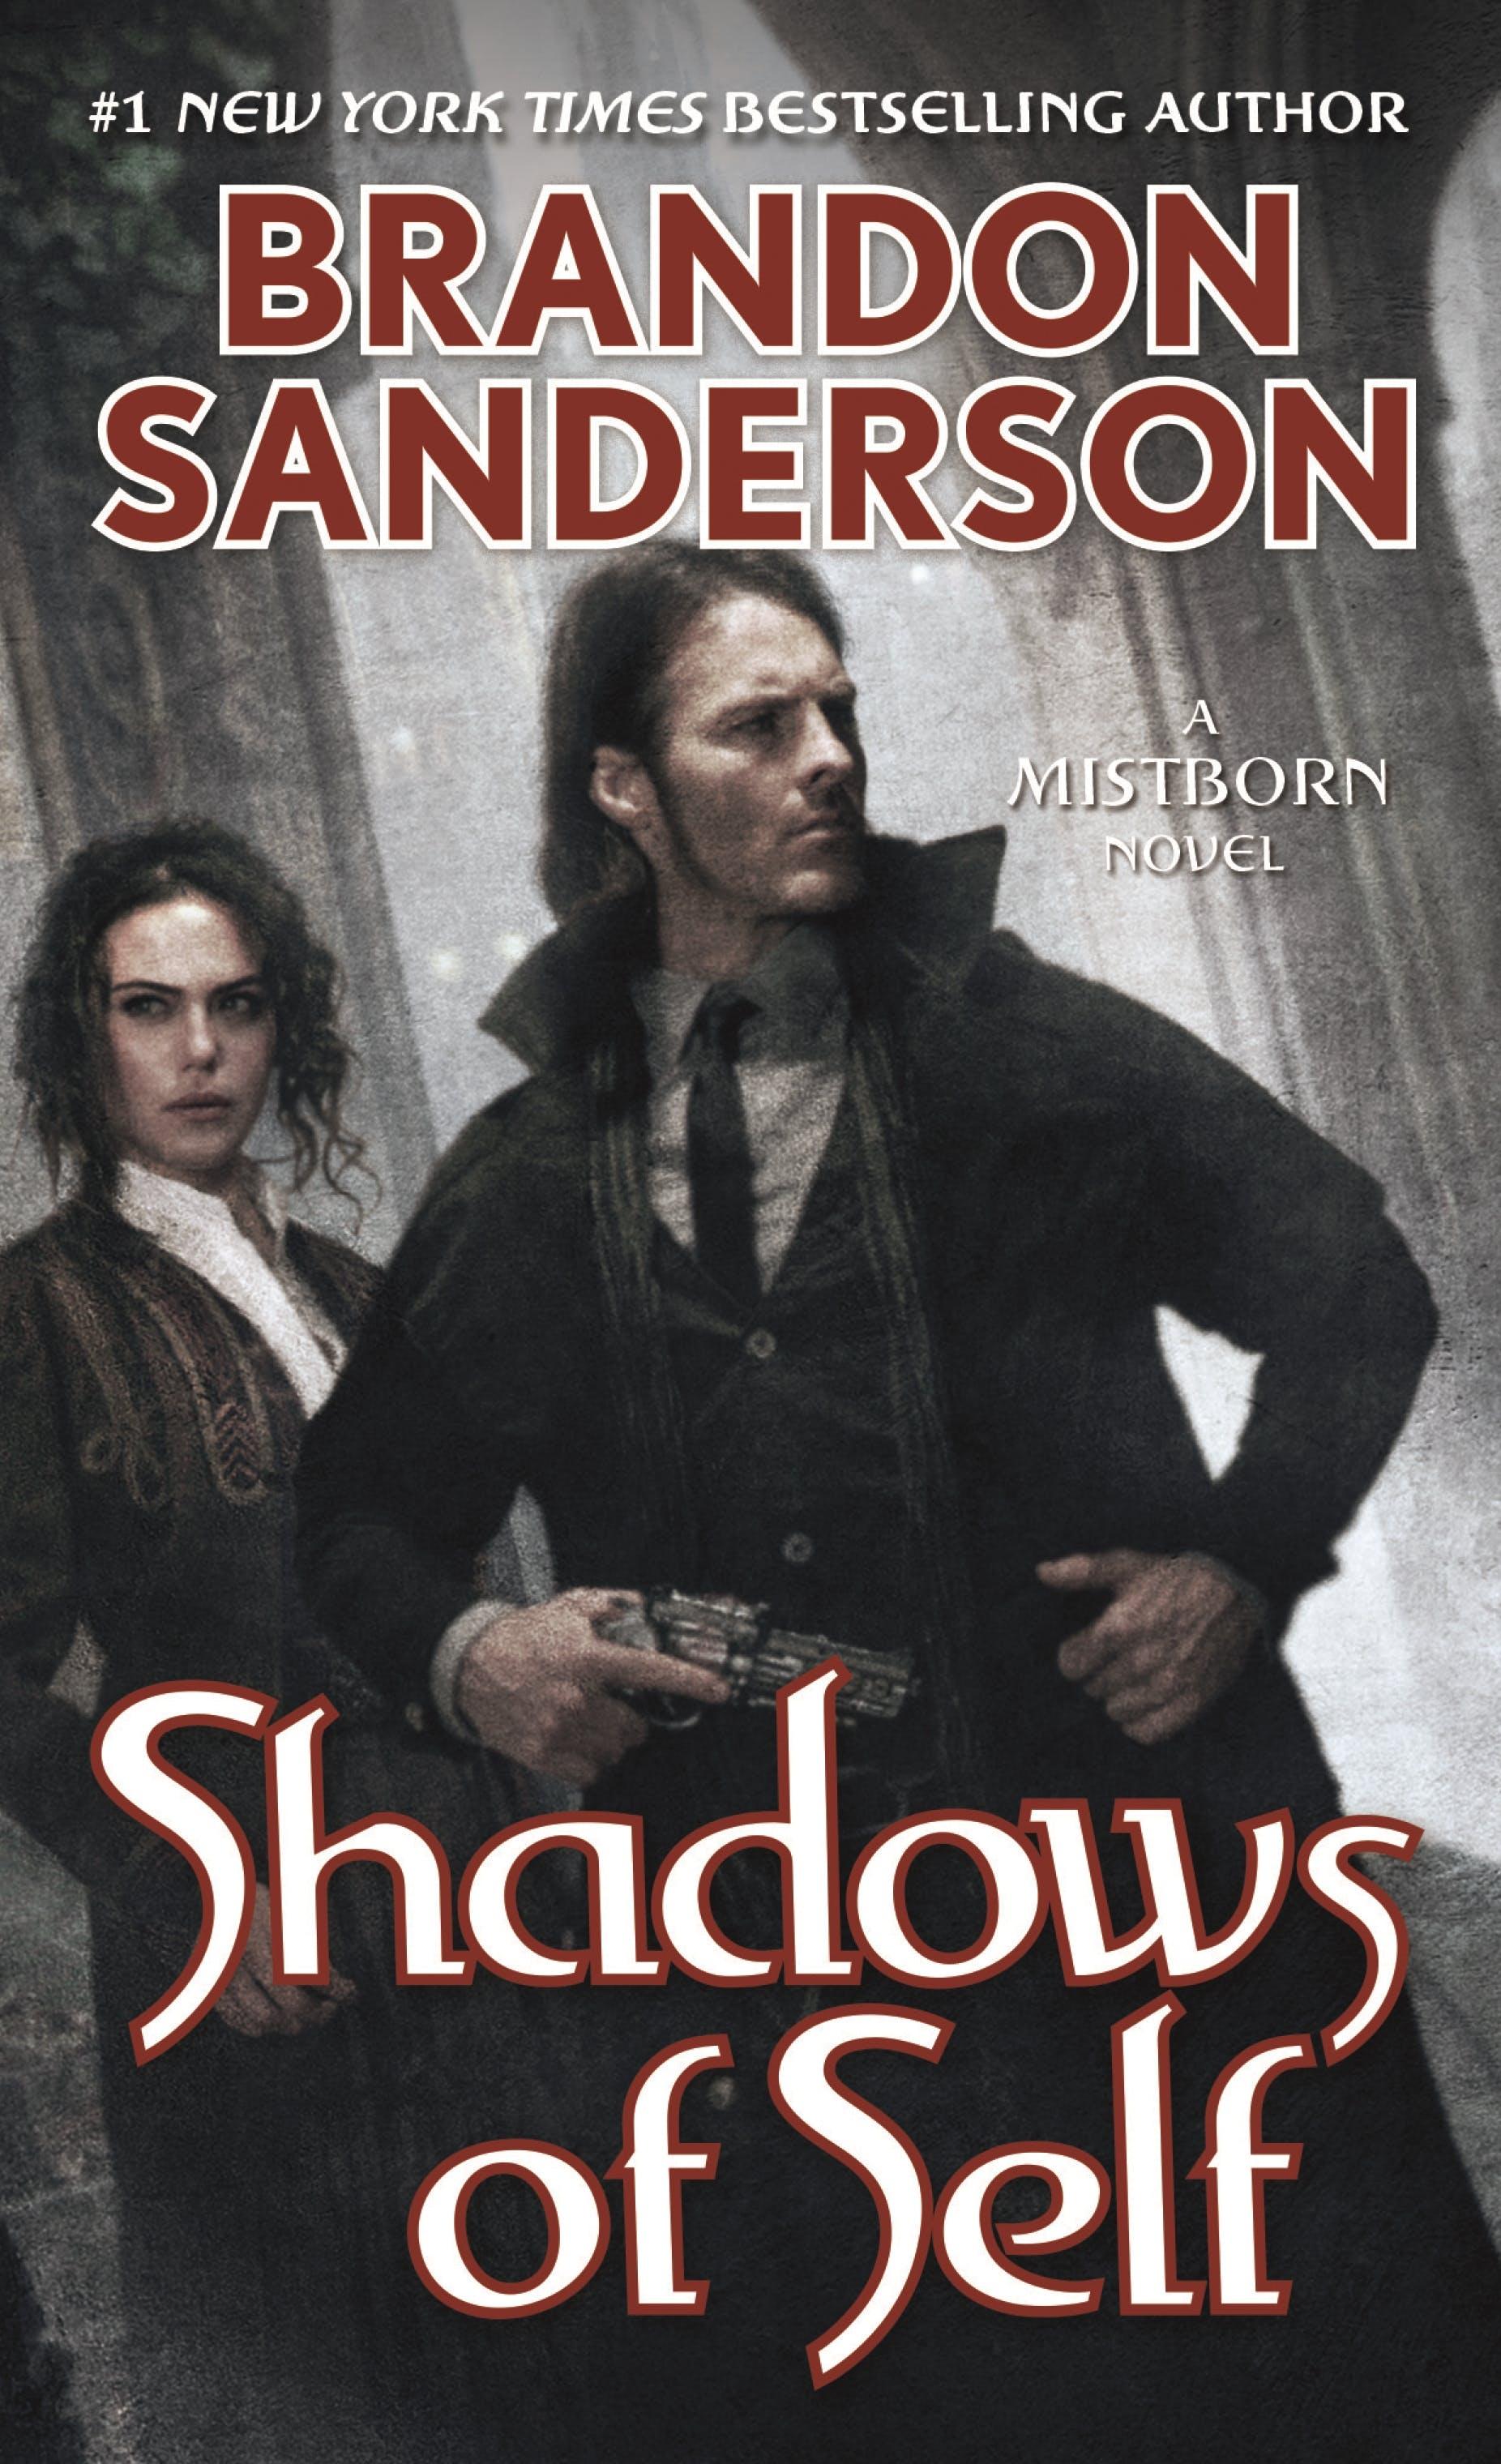 Image of Shadows of Self